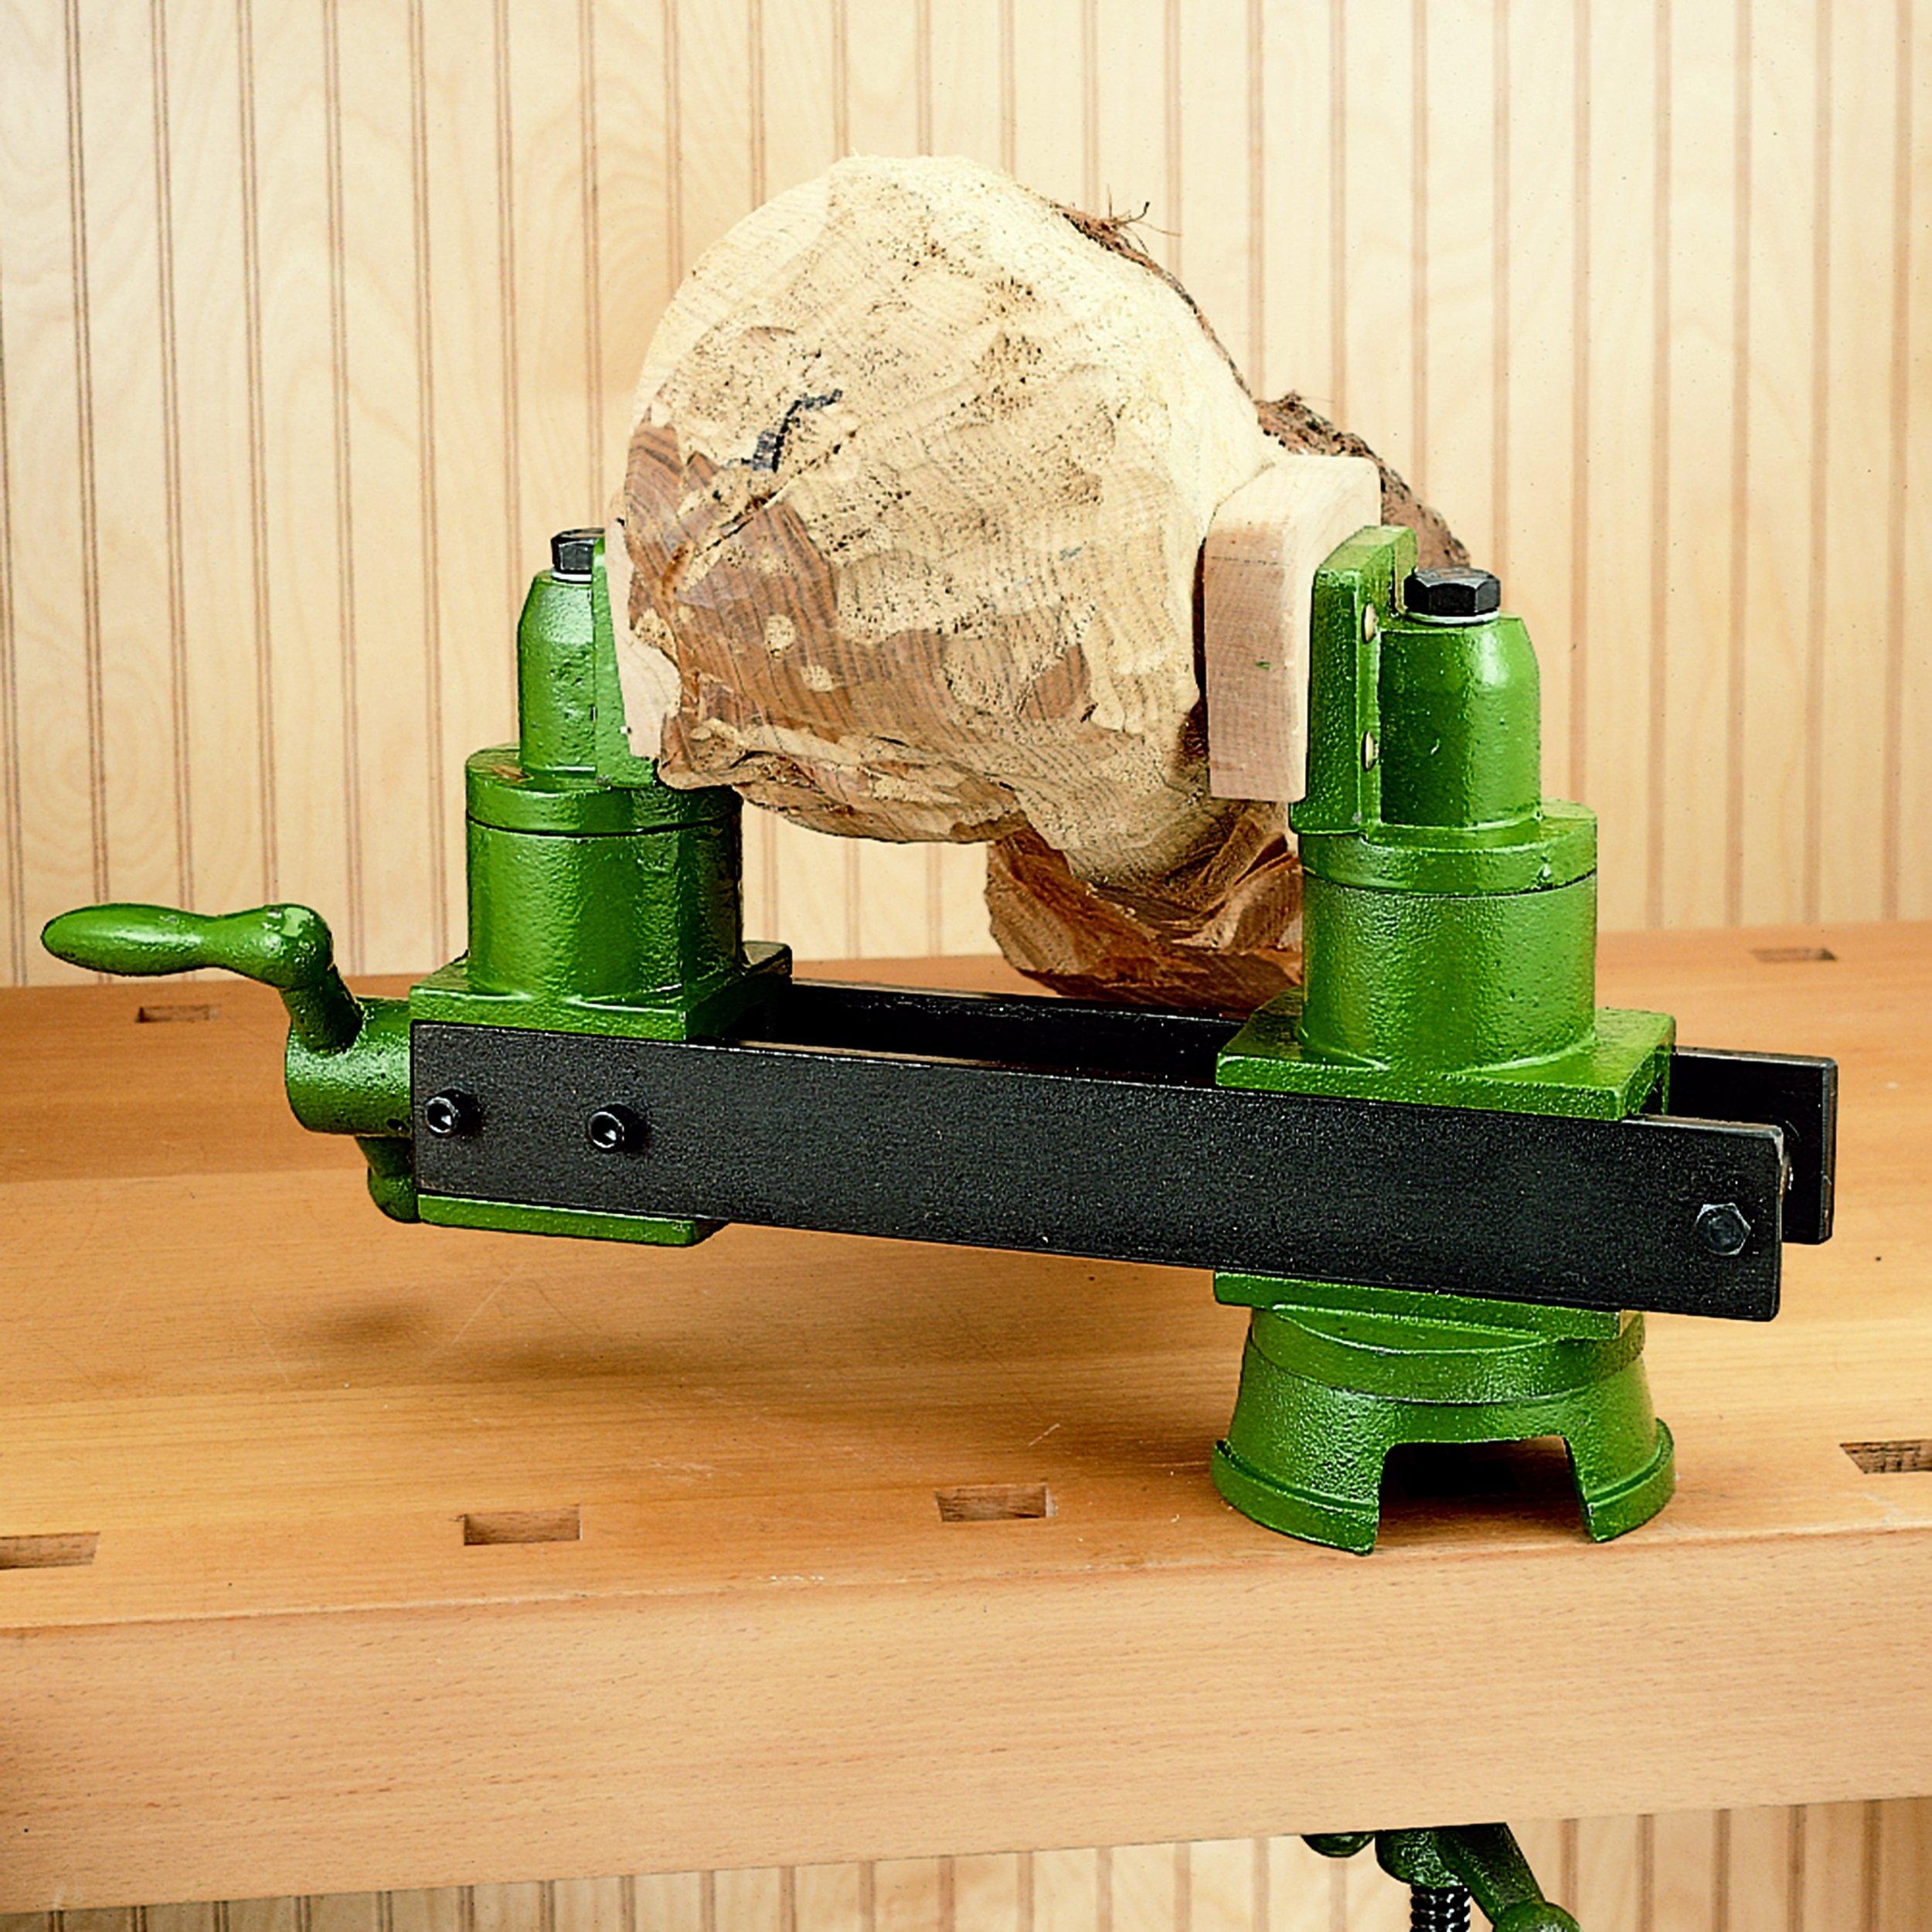 WoodRiver Patternmaker's or Gunstock Carving Vise by WoodRiver